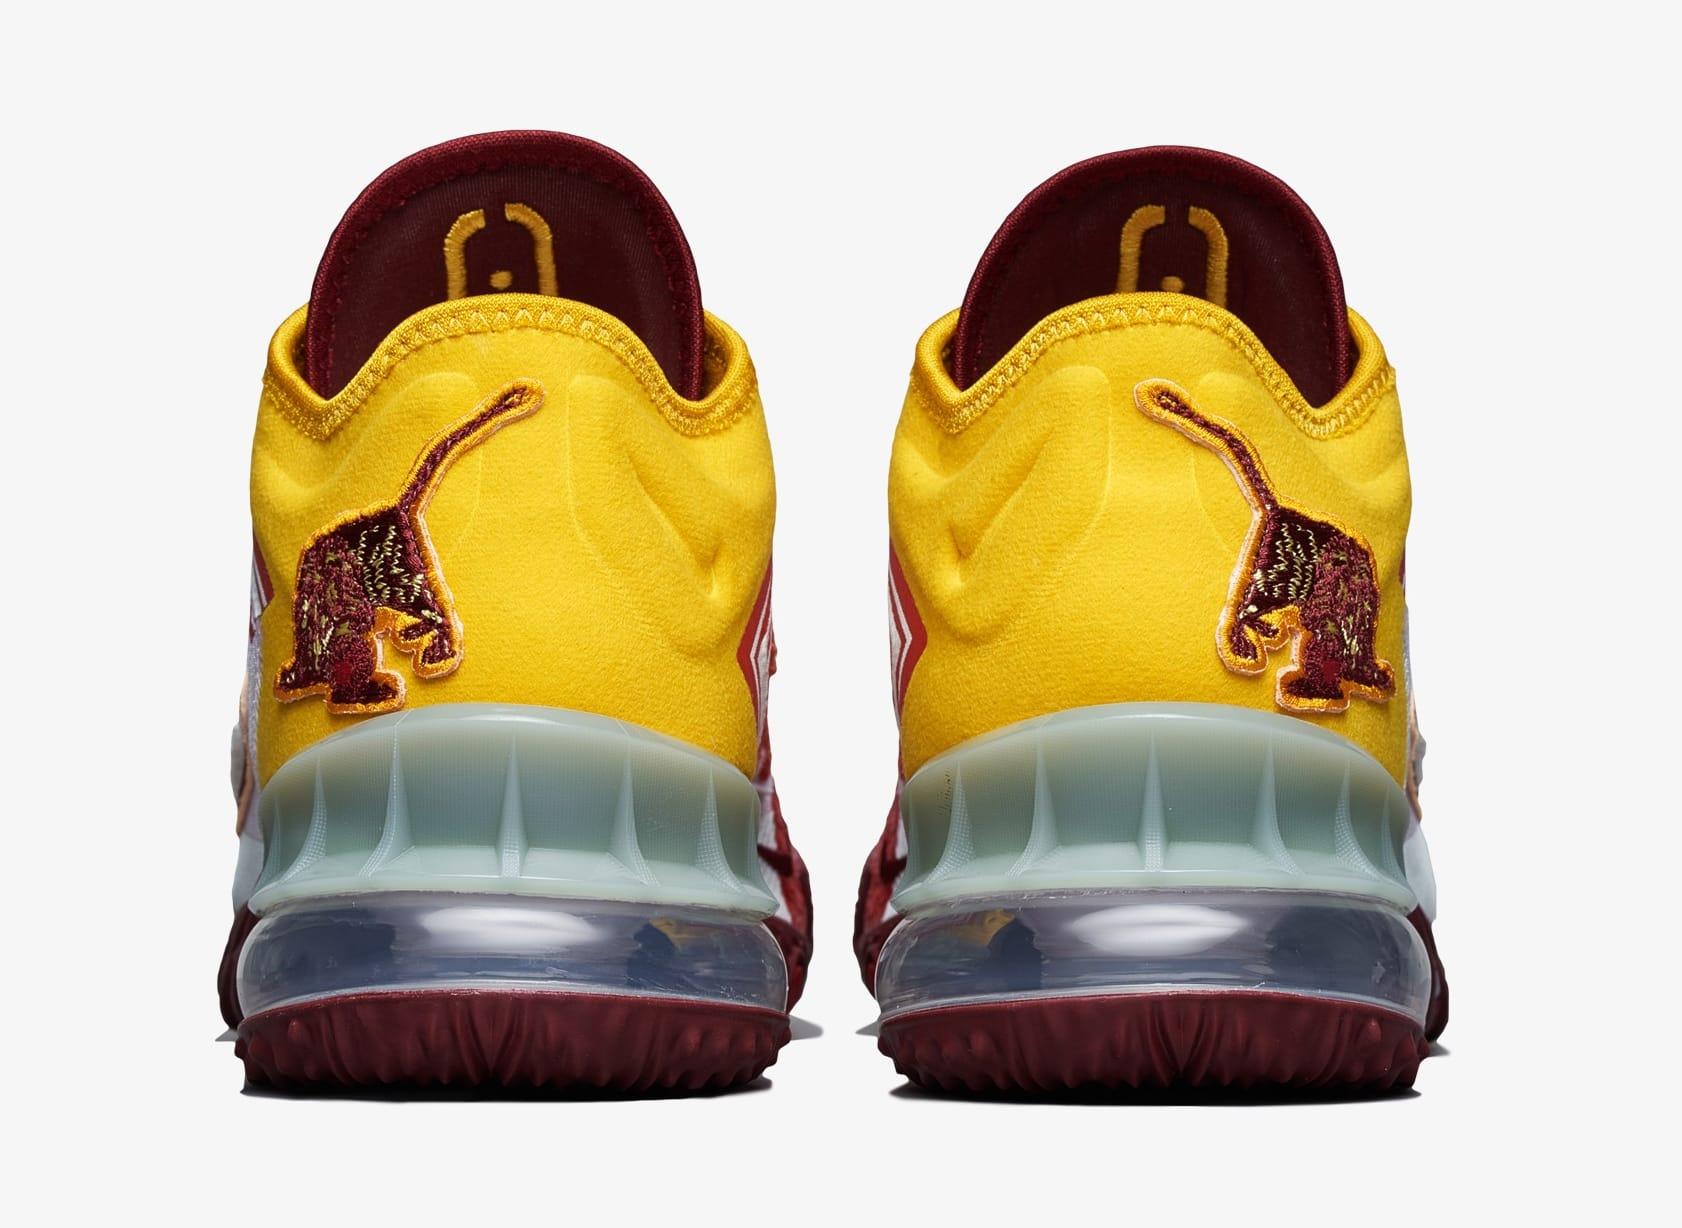 Mimi Plange x Nike LeBron 18 Low 'Higher Learning' CV7562-102 Heel